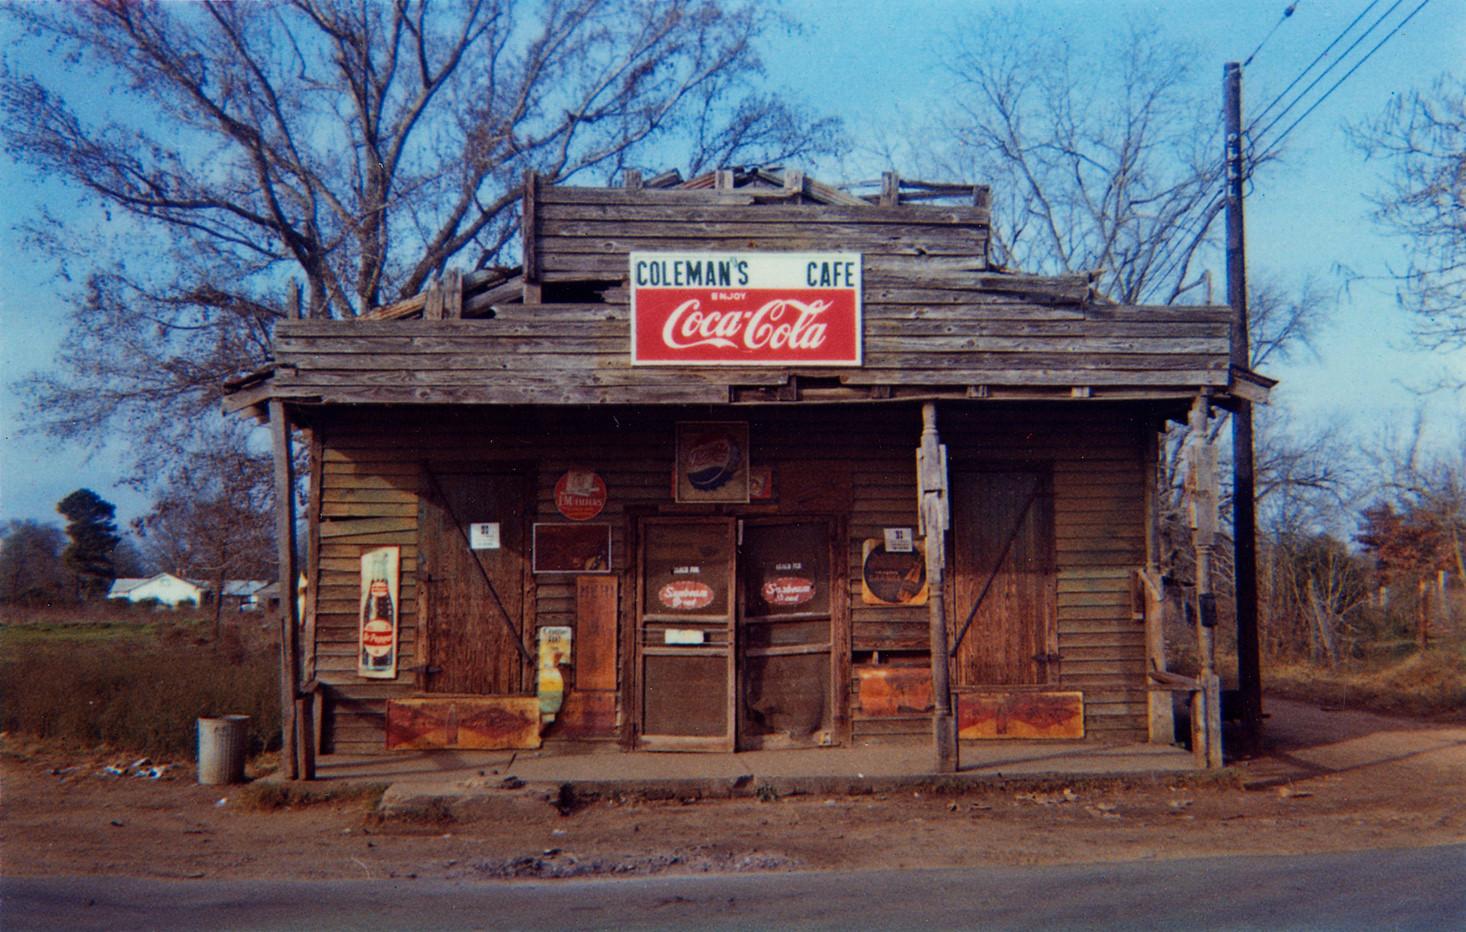 William Christenberry, Coleman's Cafe, Greensboro, Alabama, 1971